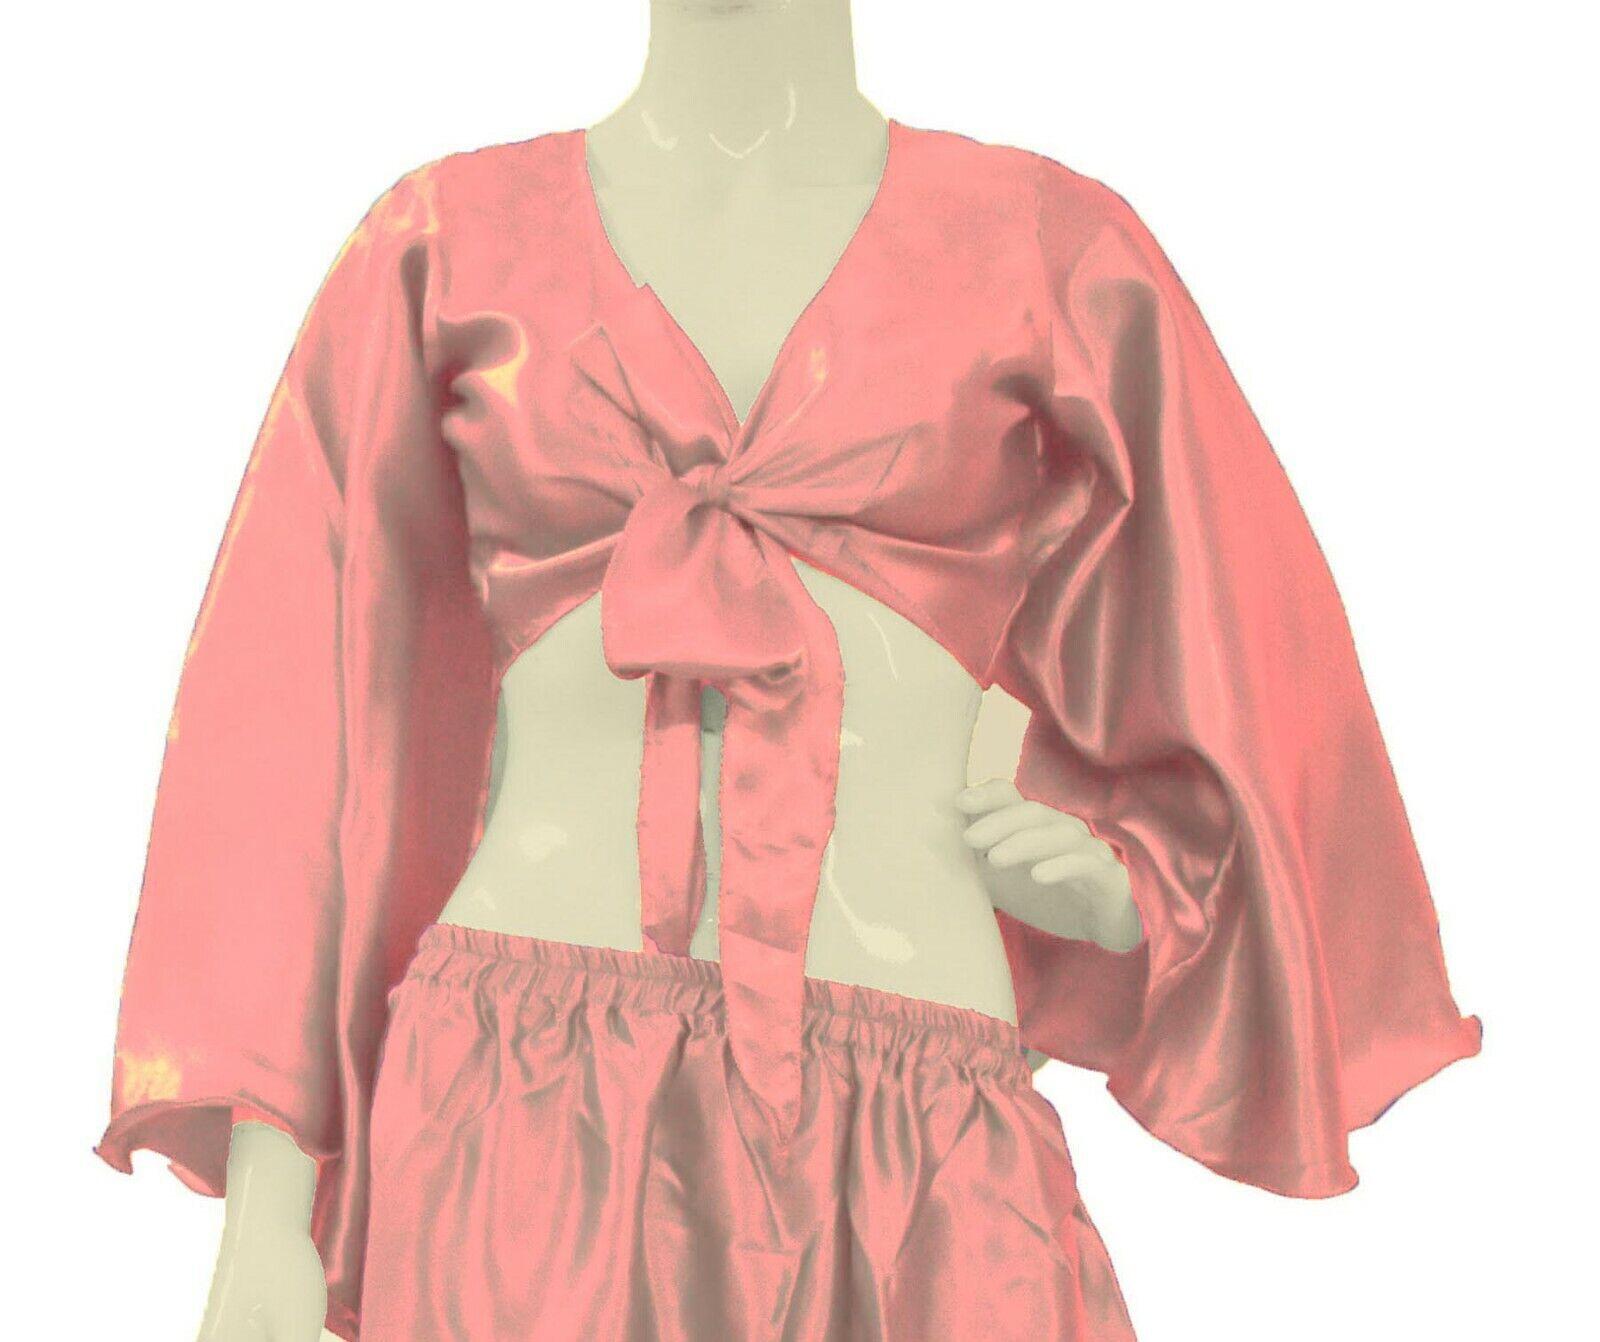 Bowknot Crop Top Ruffle Wrap Top Tie Salmon Color Belly Dance Wear S29